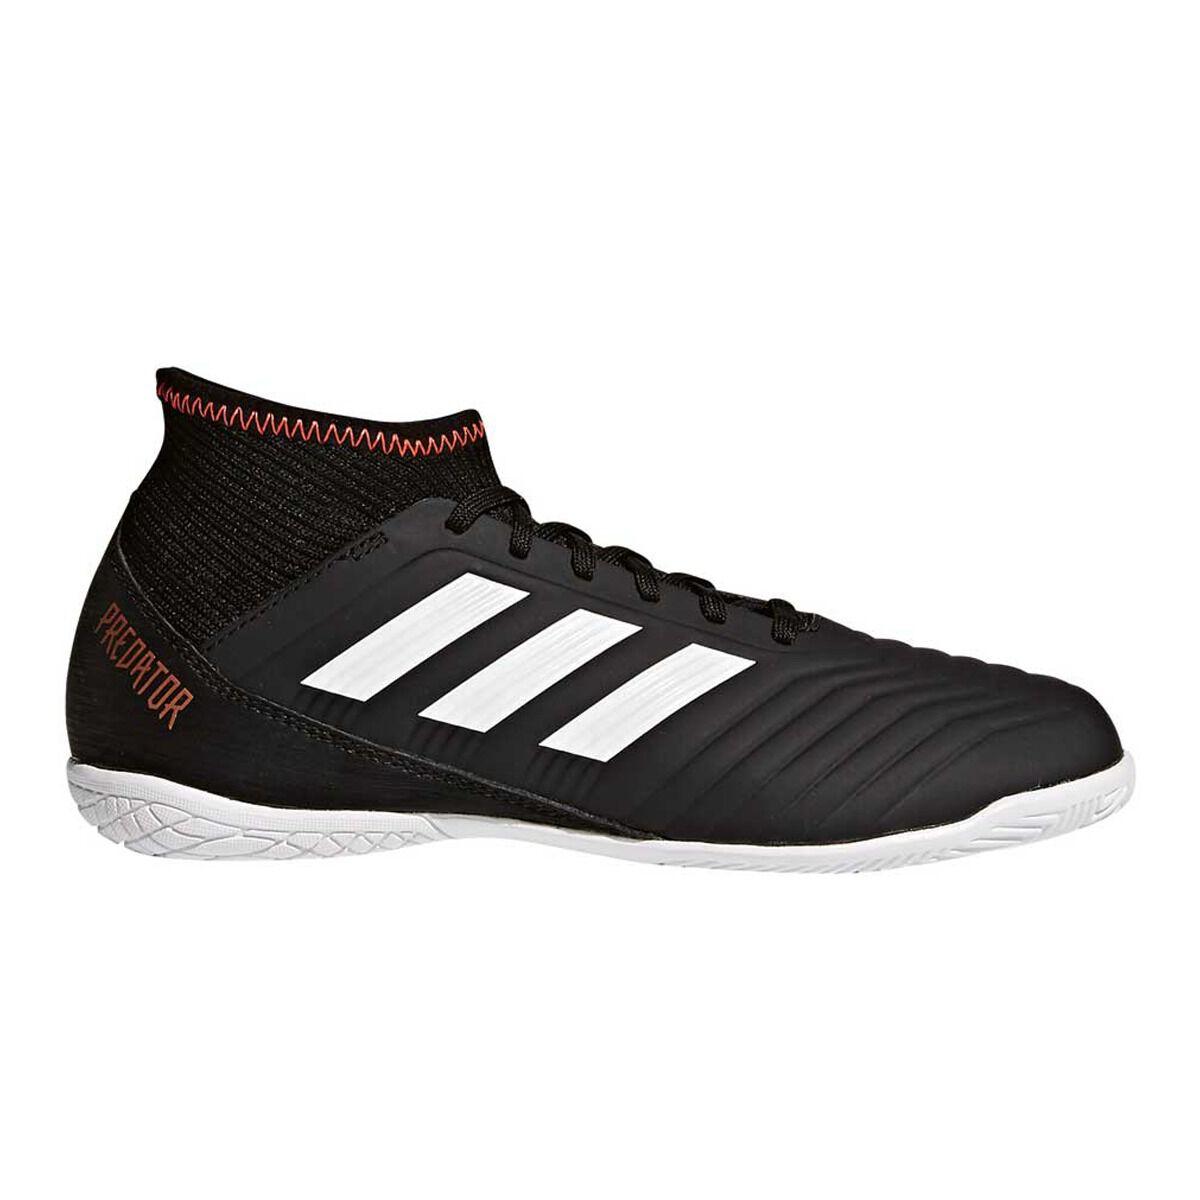 Predator Adidas Shoes Black Tango Soccer 18 3 Junior White Indoor deCxBWro